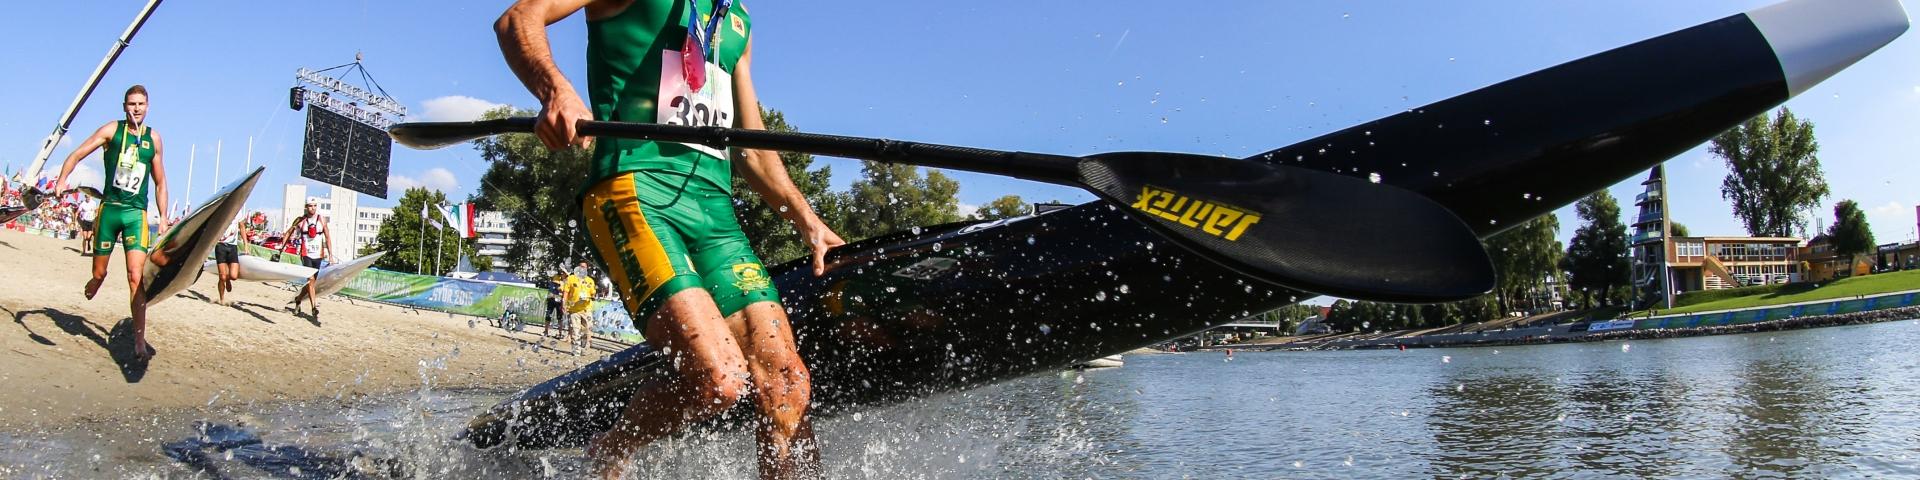 Hank McGregor (RSA), Canoe Marathon